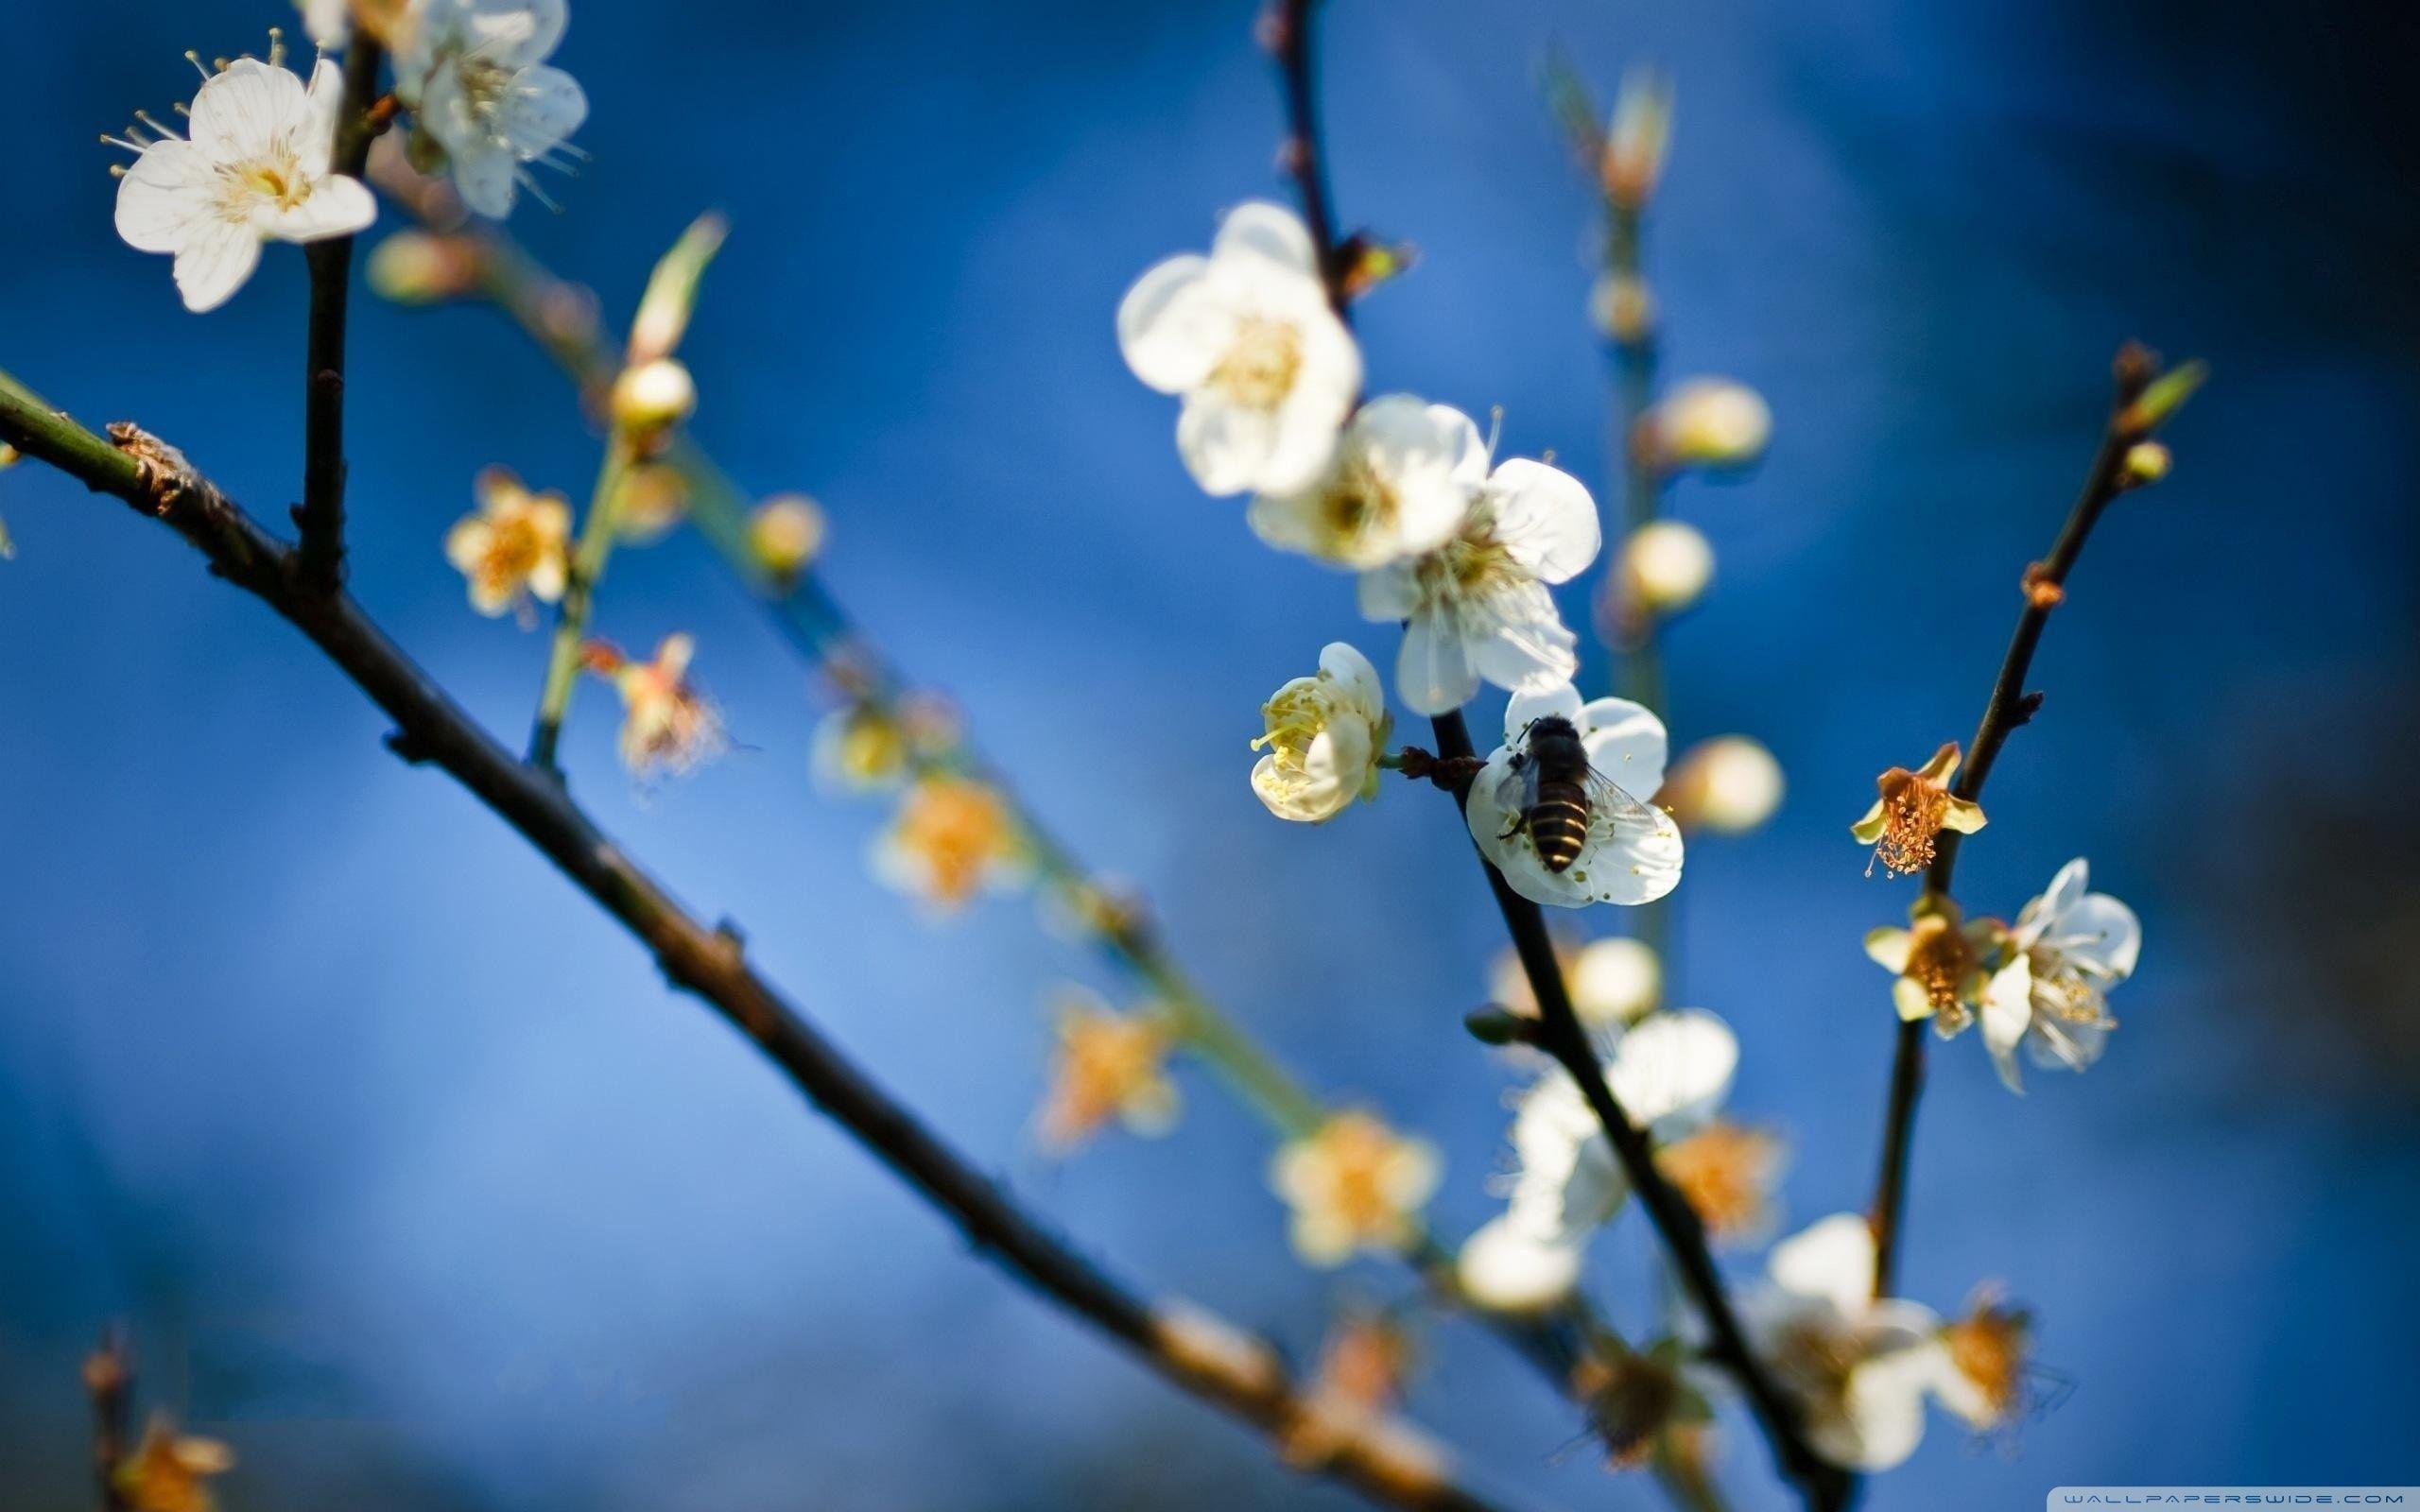 Spring Flowers Wallpapers - WallpaperSafari